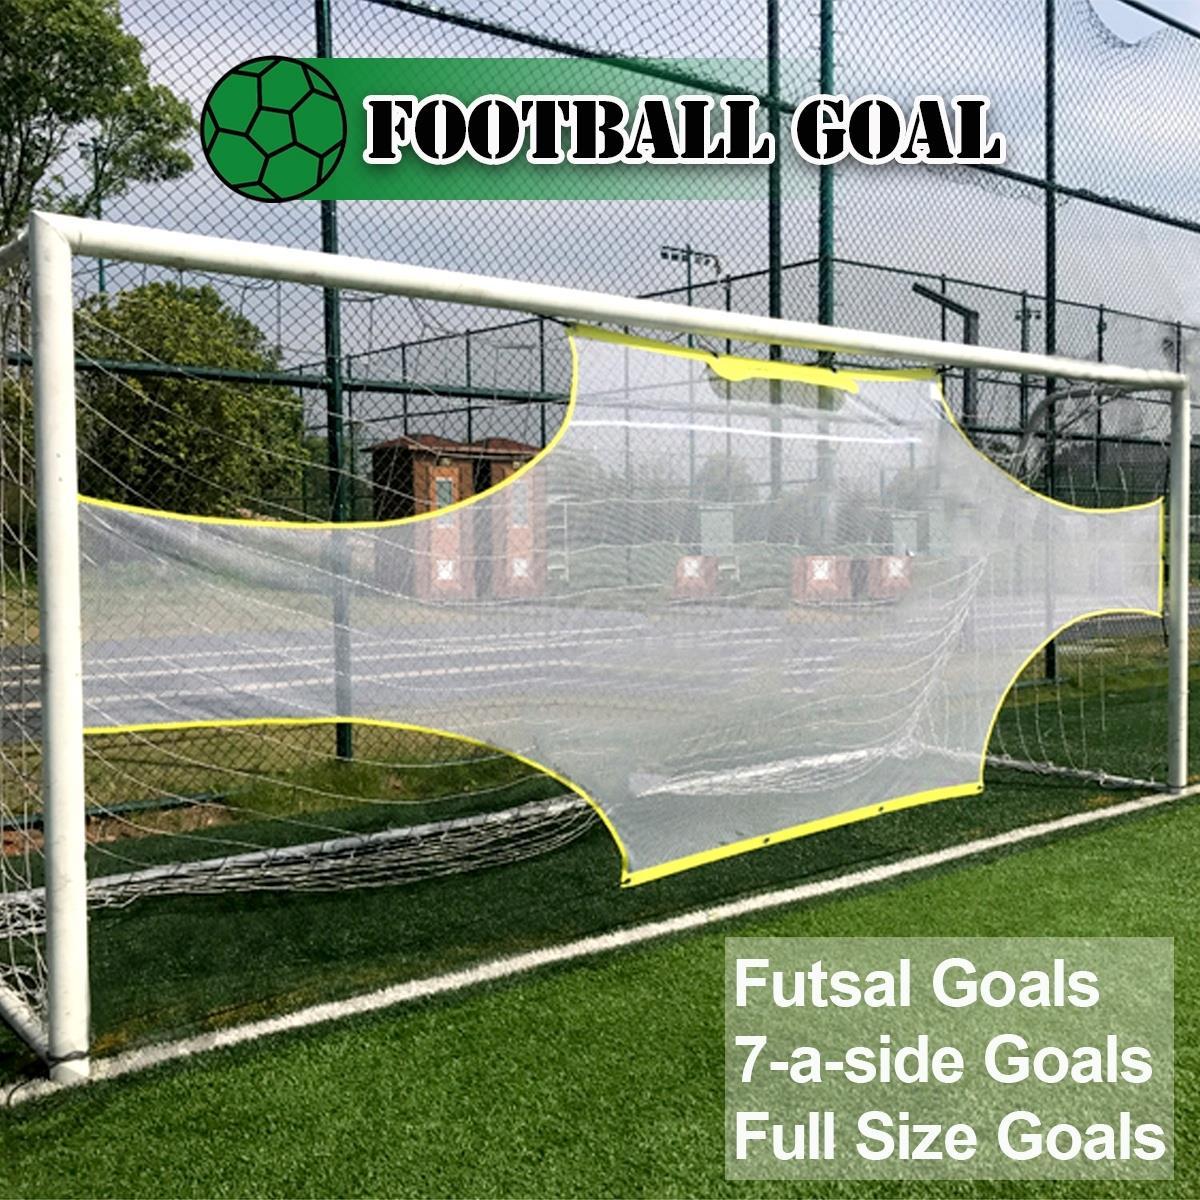 11 person Large Soccer Target Practice Training Shot Goal Net Portable Soccer Ball for Children Students Soccer Training Tool